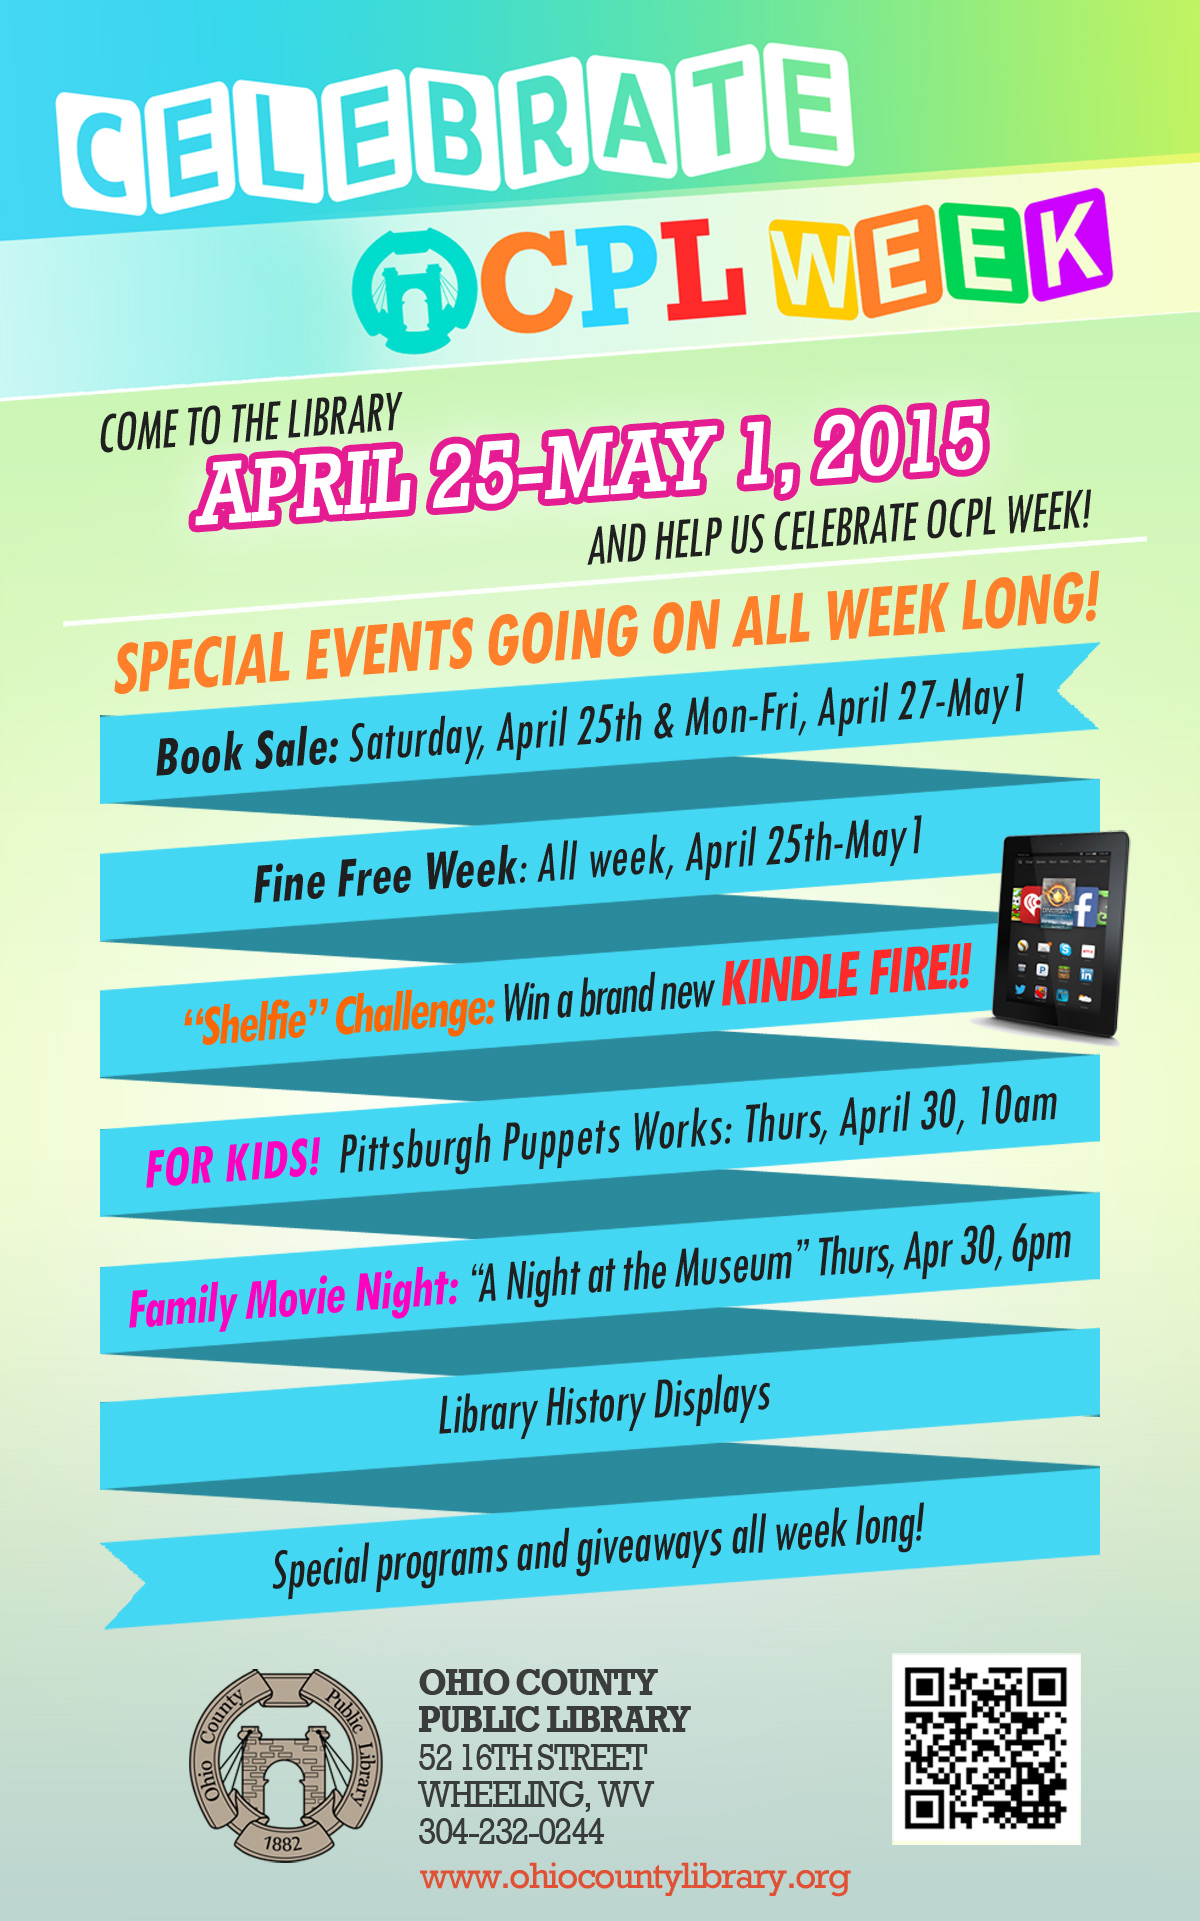 Celebrate OCPL Week!